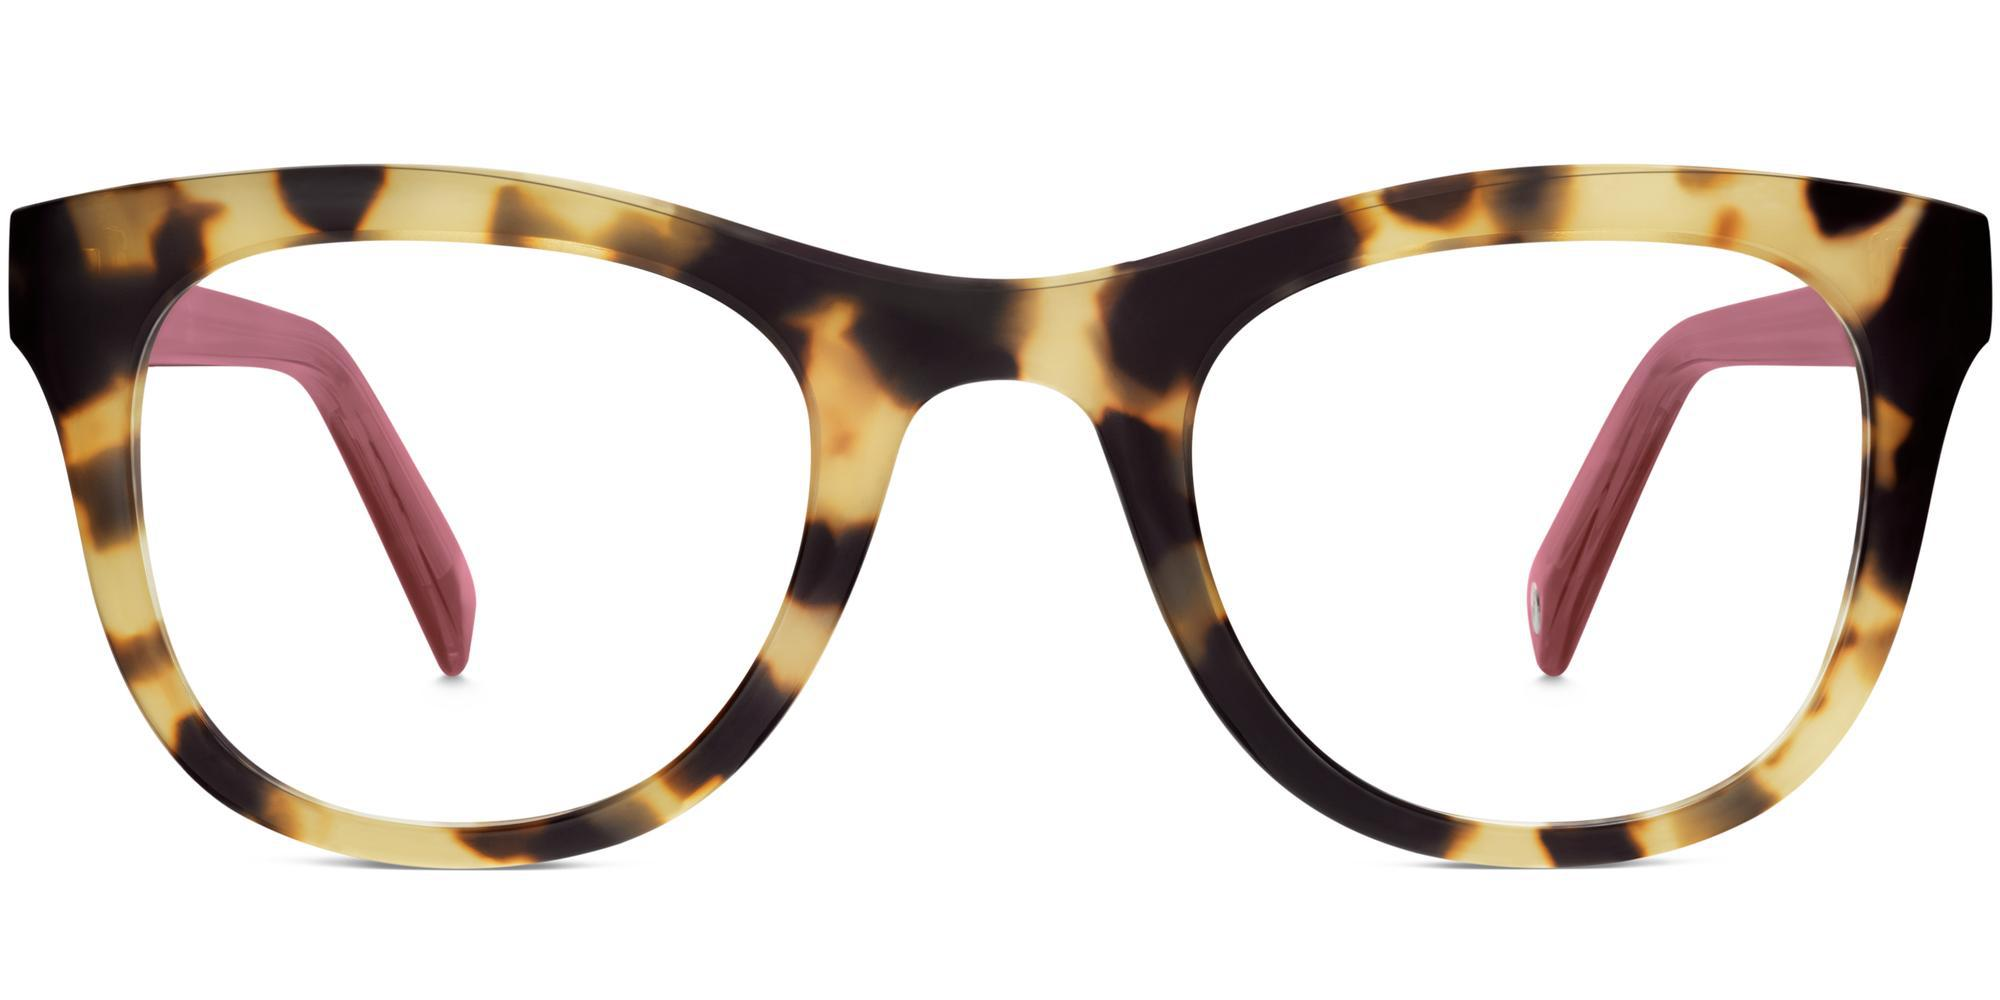 Lyst - Warby Parker Cora Eyeglasses